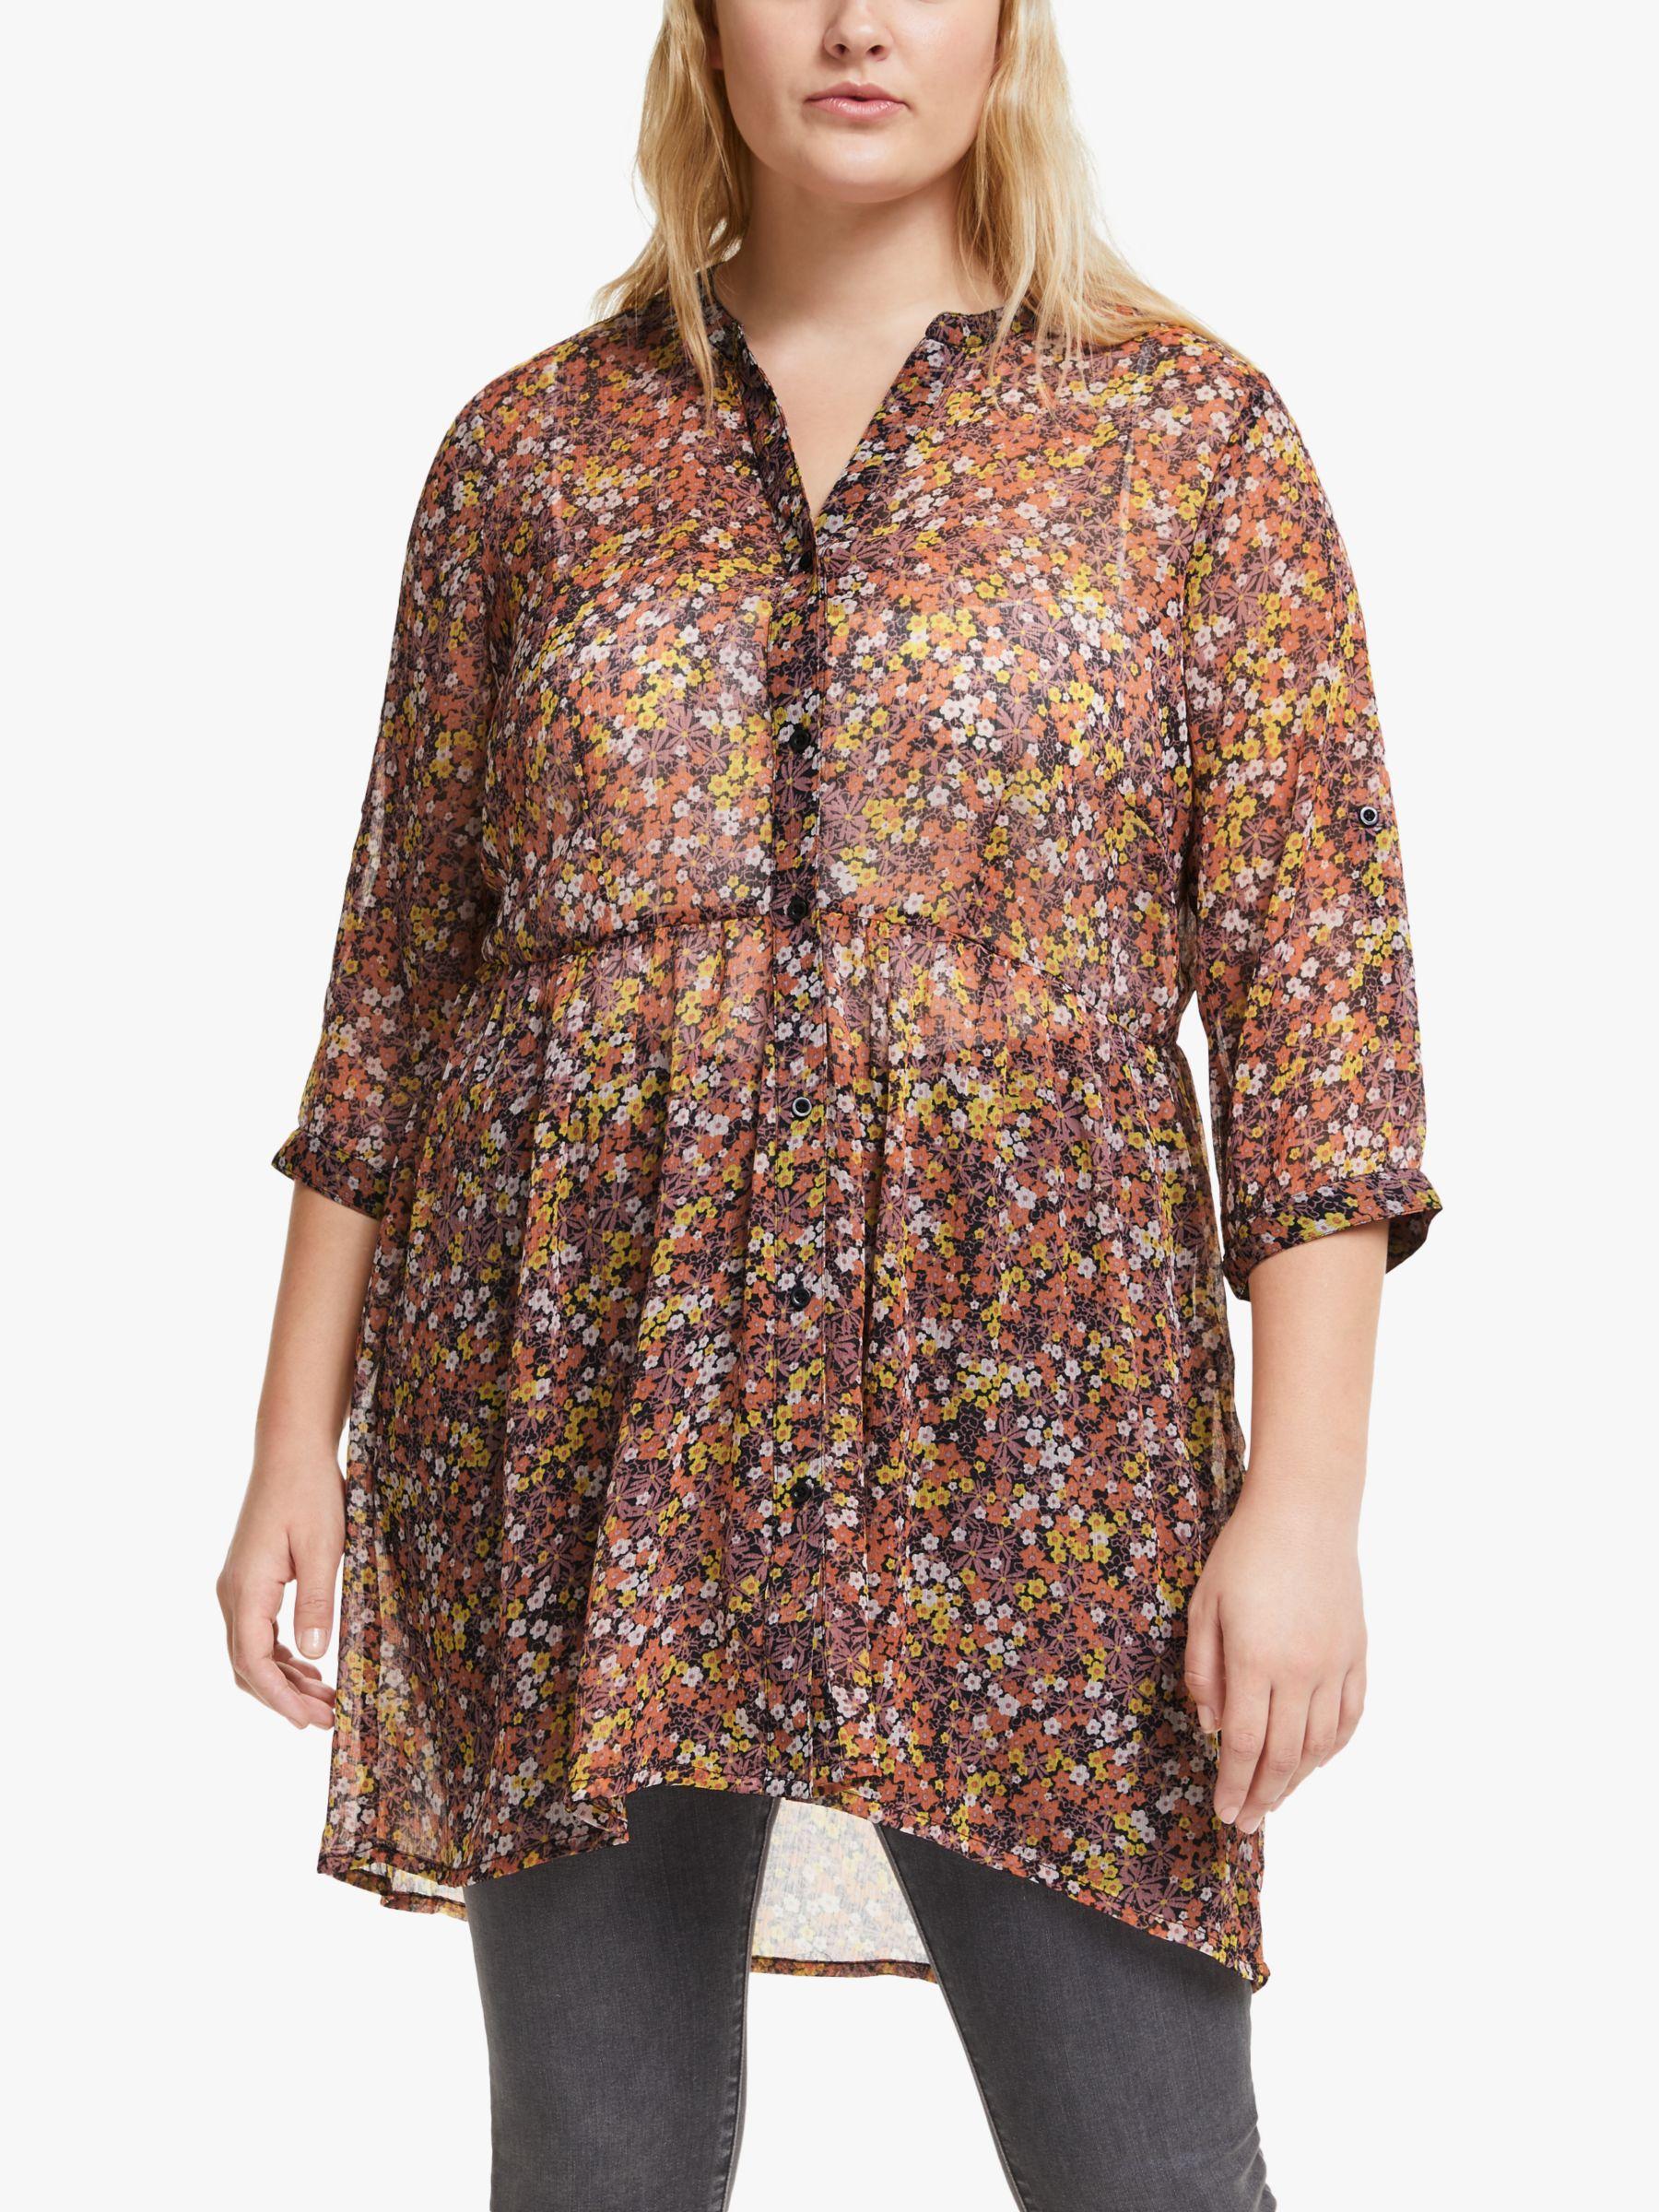 Junarose JUNAROSE Curve Ariarevea Floral Print Shirt, Dusty Orchid